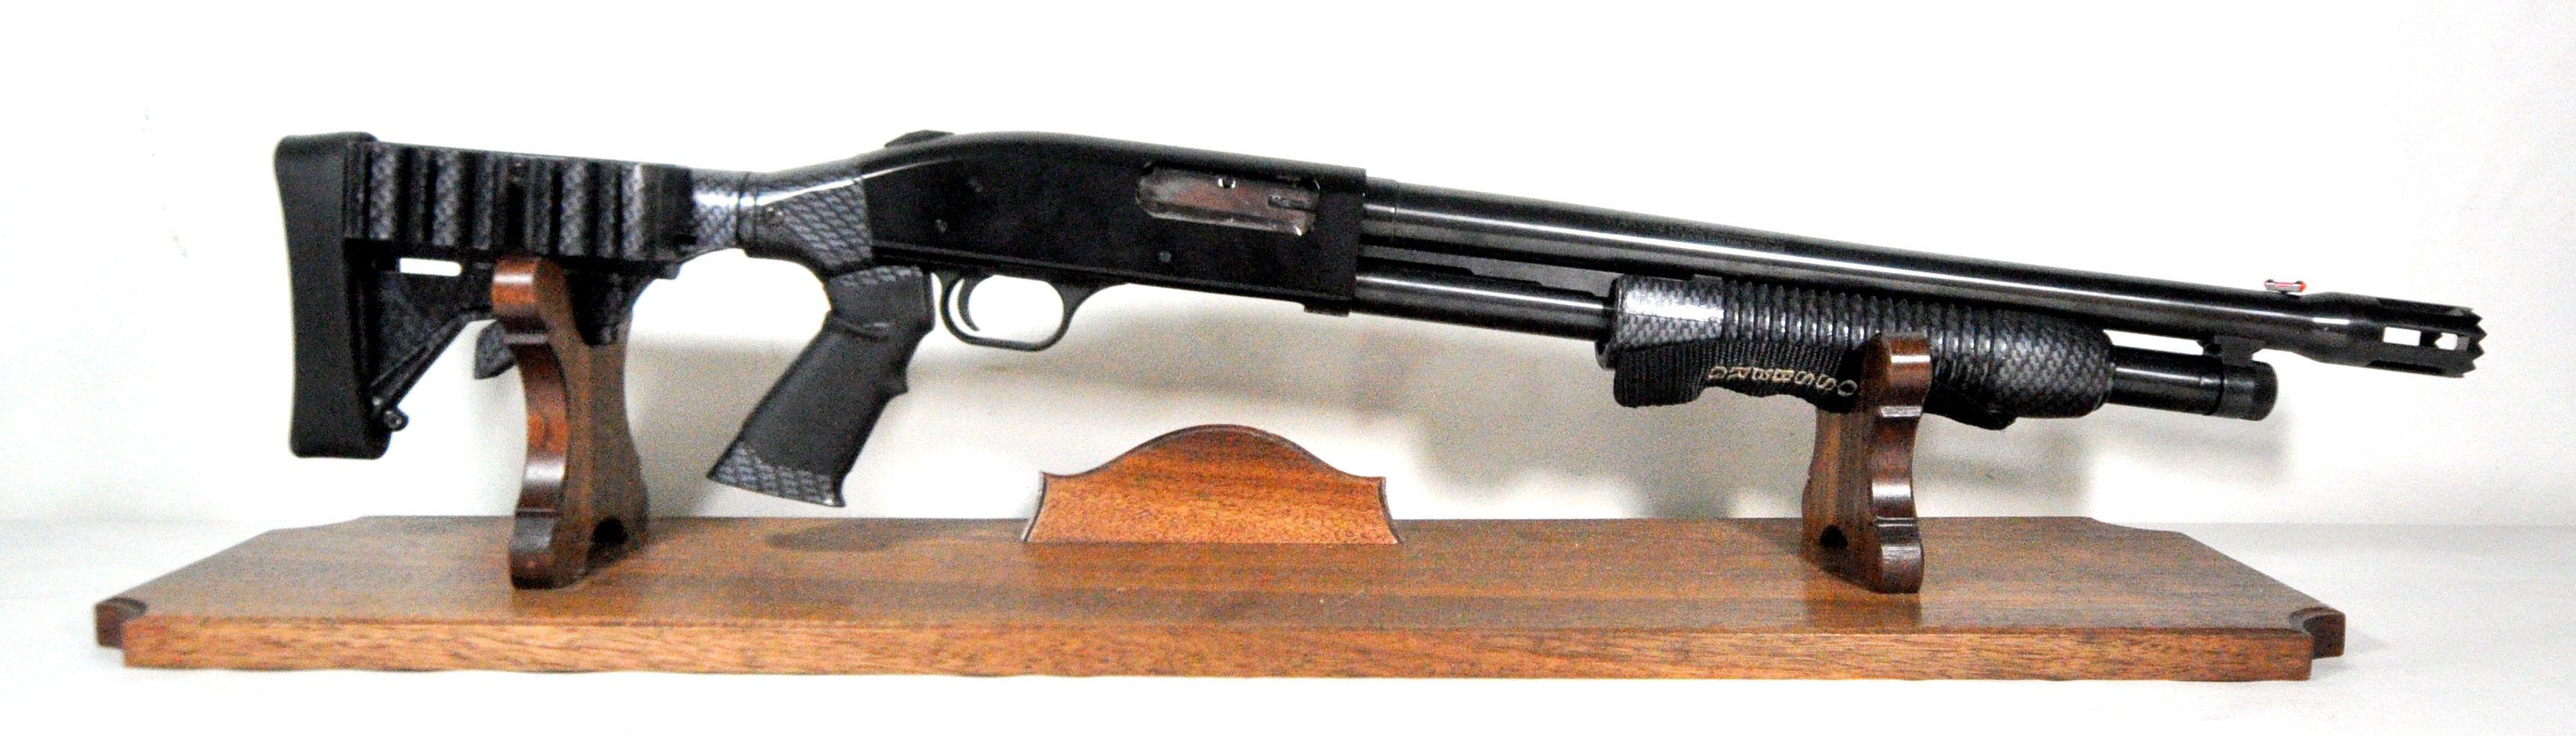 Pin on mmp guns rifles shotguns